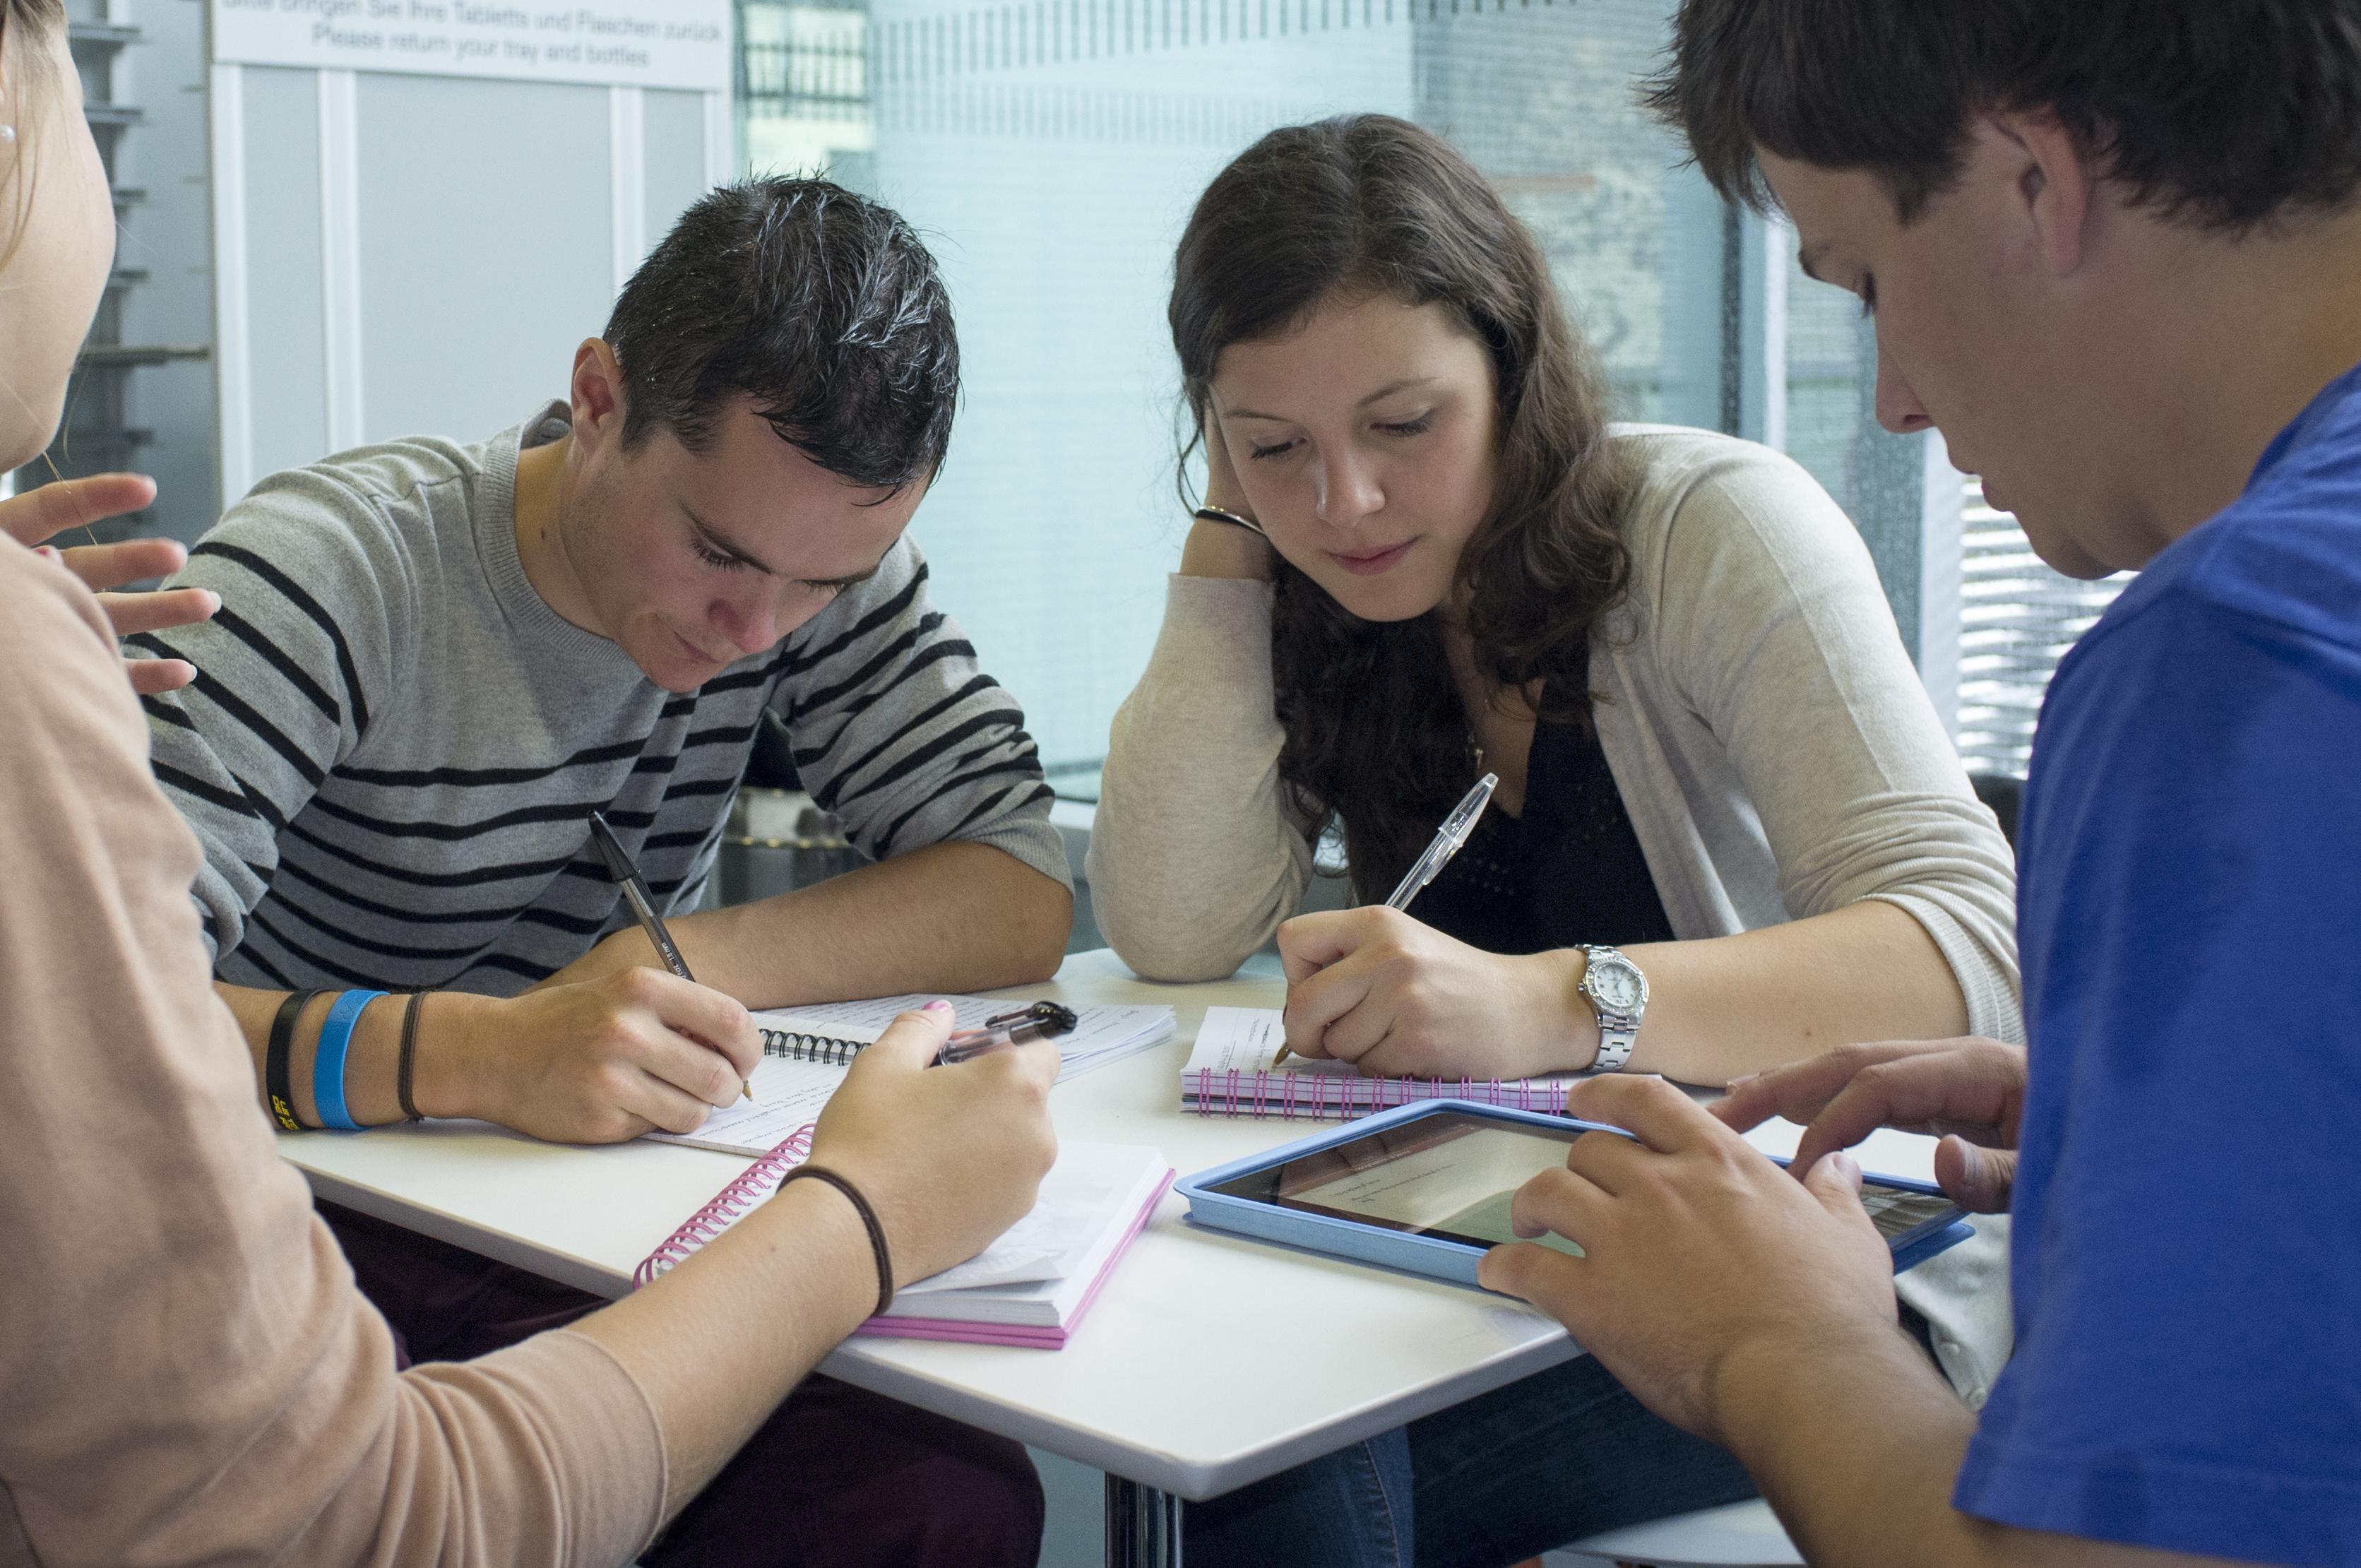 human geography study group jpg sia jpg background image jpg the essay factory